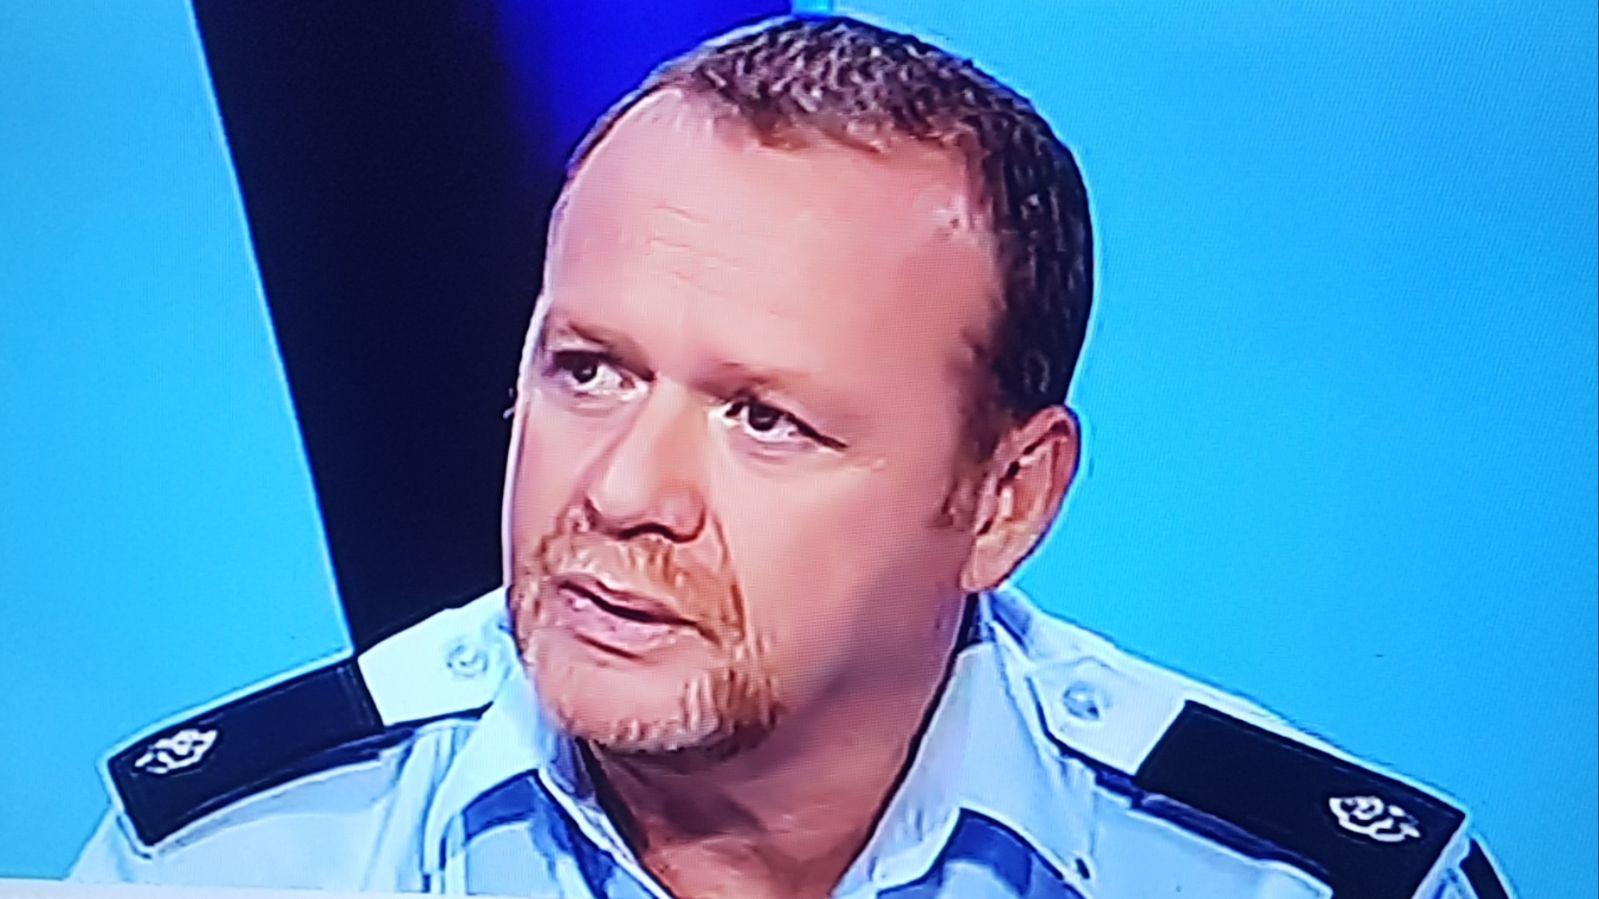 Михаэль Зингерман. Фото: пресс-служба полиции